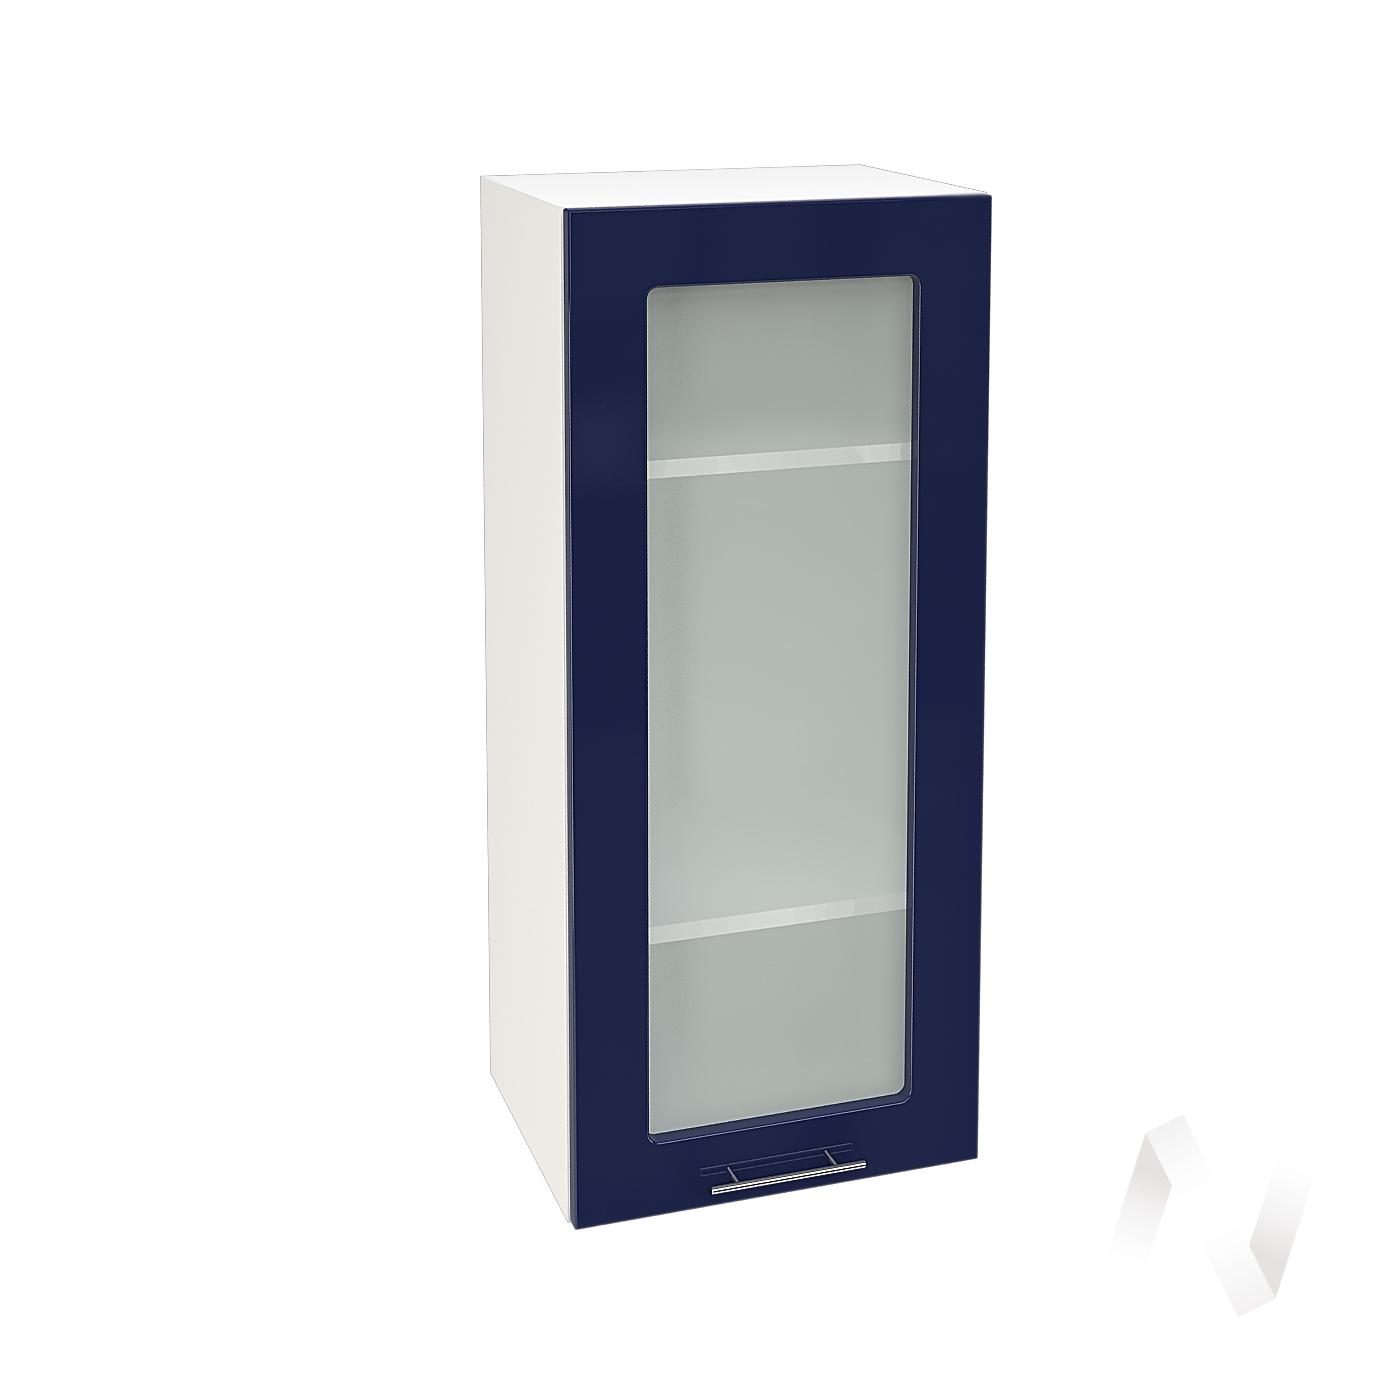 "Кухня ""Валерия-М"": Шкаф верхний со стеклом 409, ШВС 409 (Синий глянец/корпус белый)"